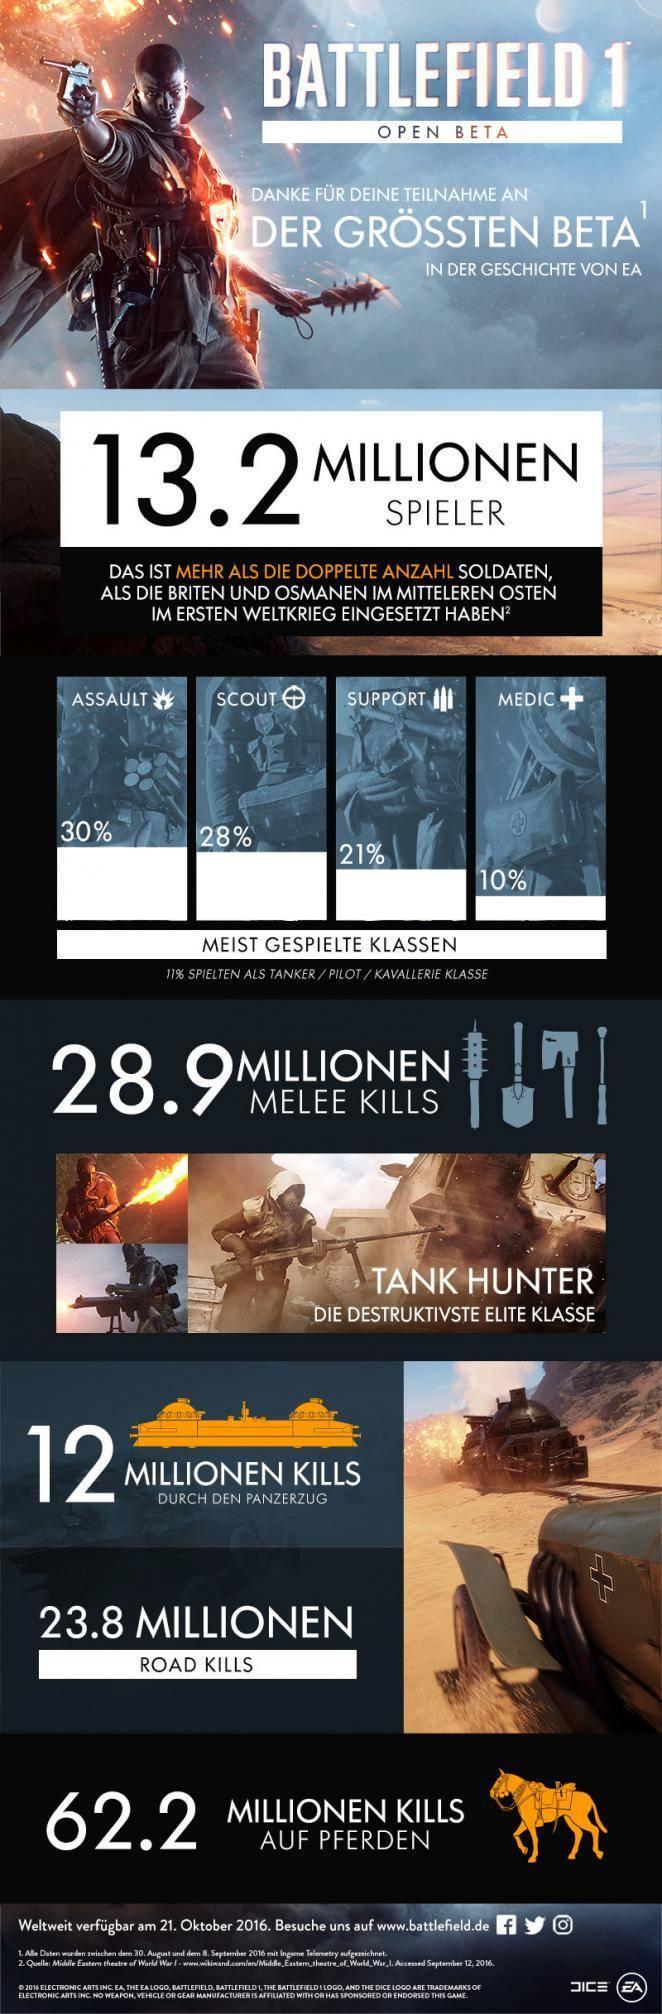 battlefield-1_open-beta-grafik